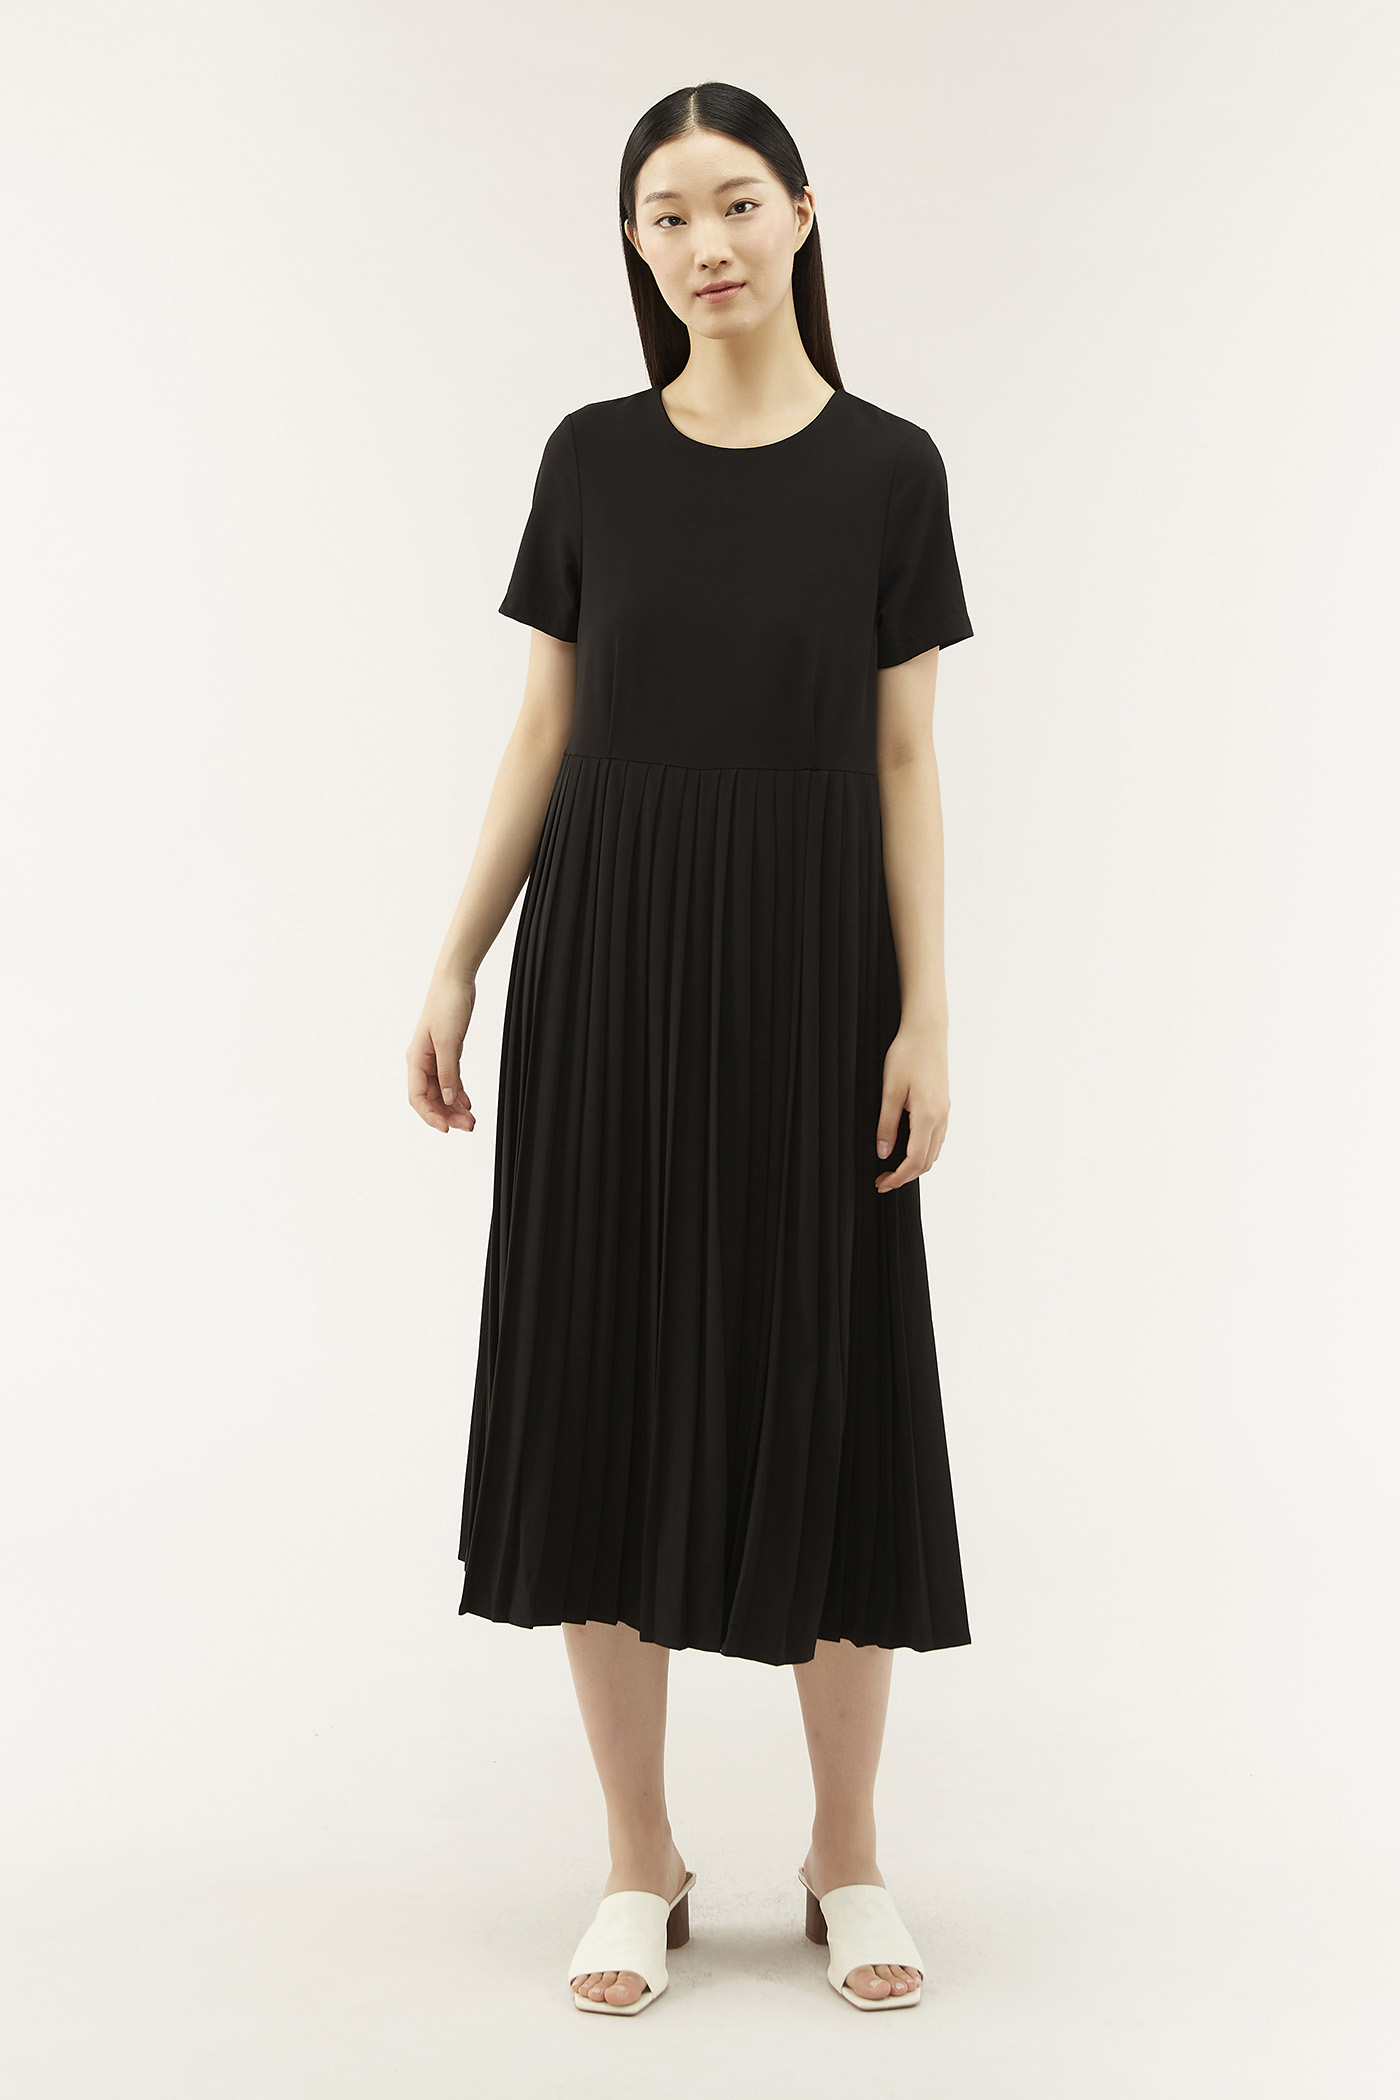 Tarryn Pleat Dress